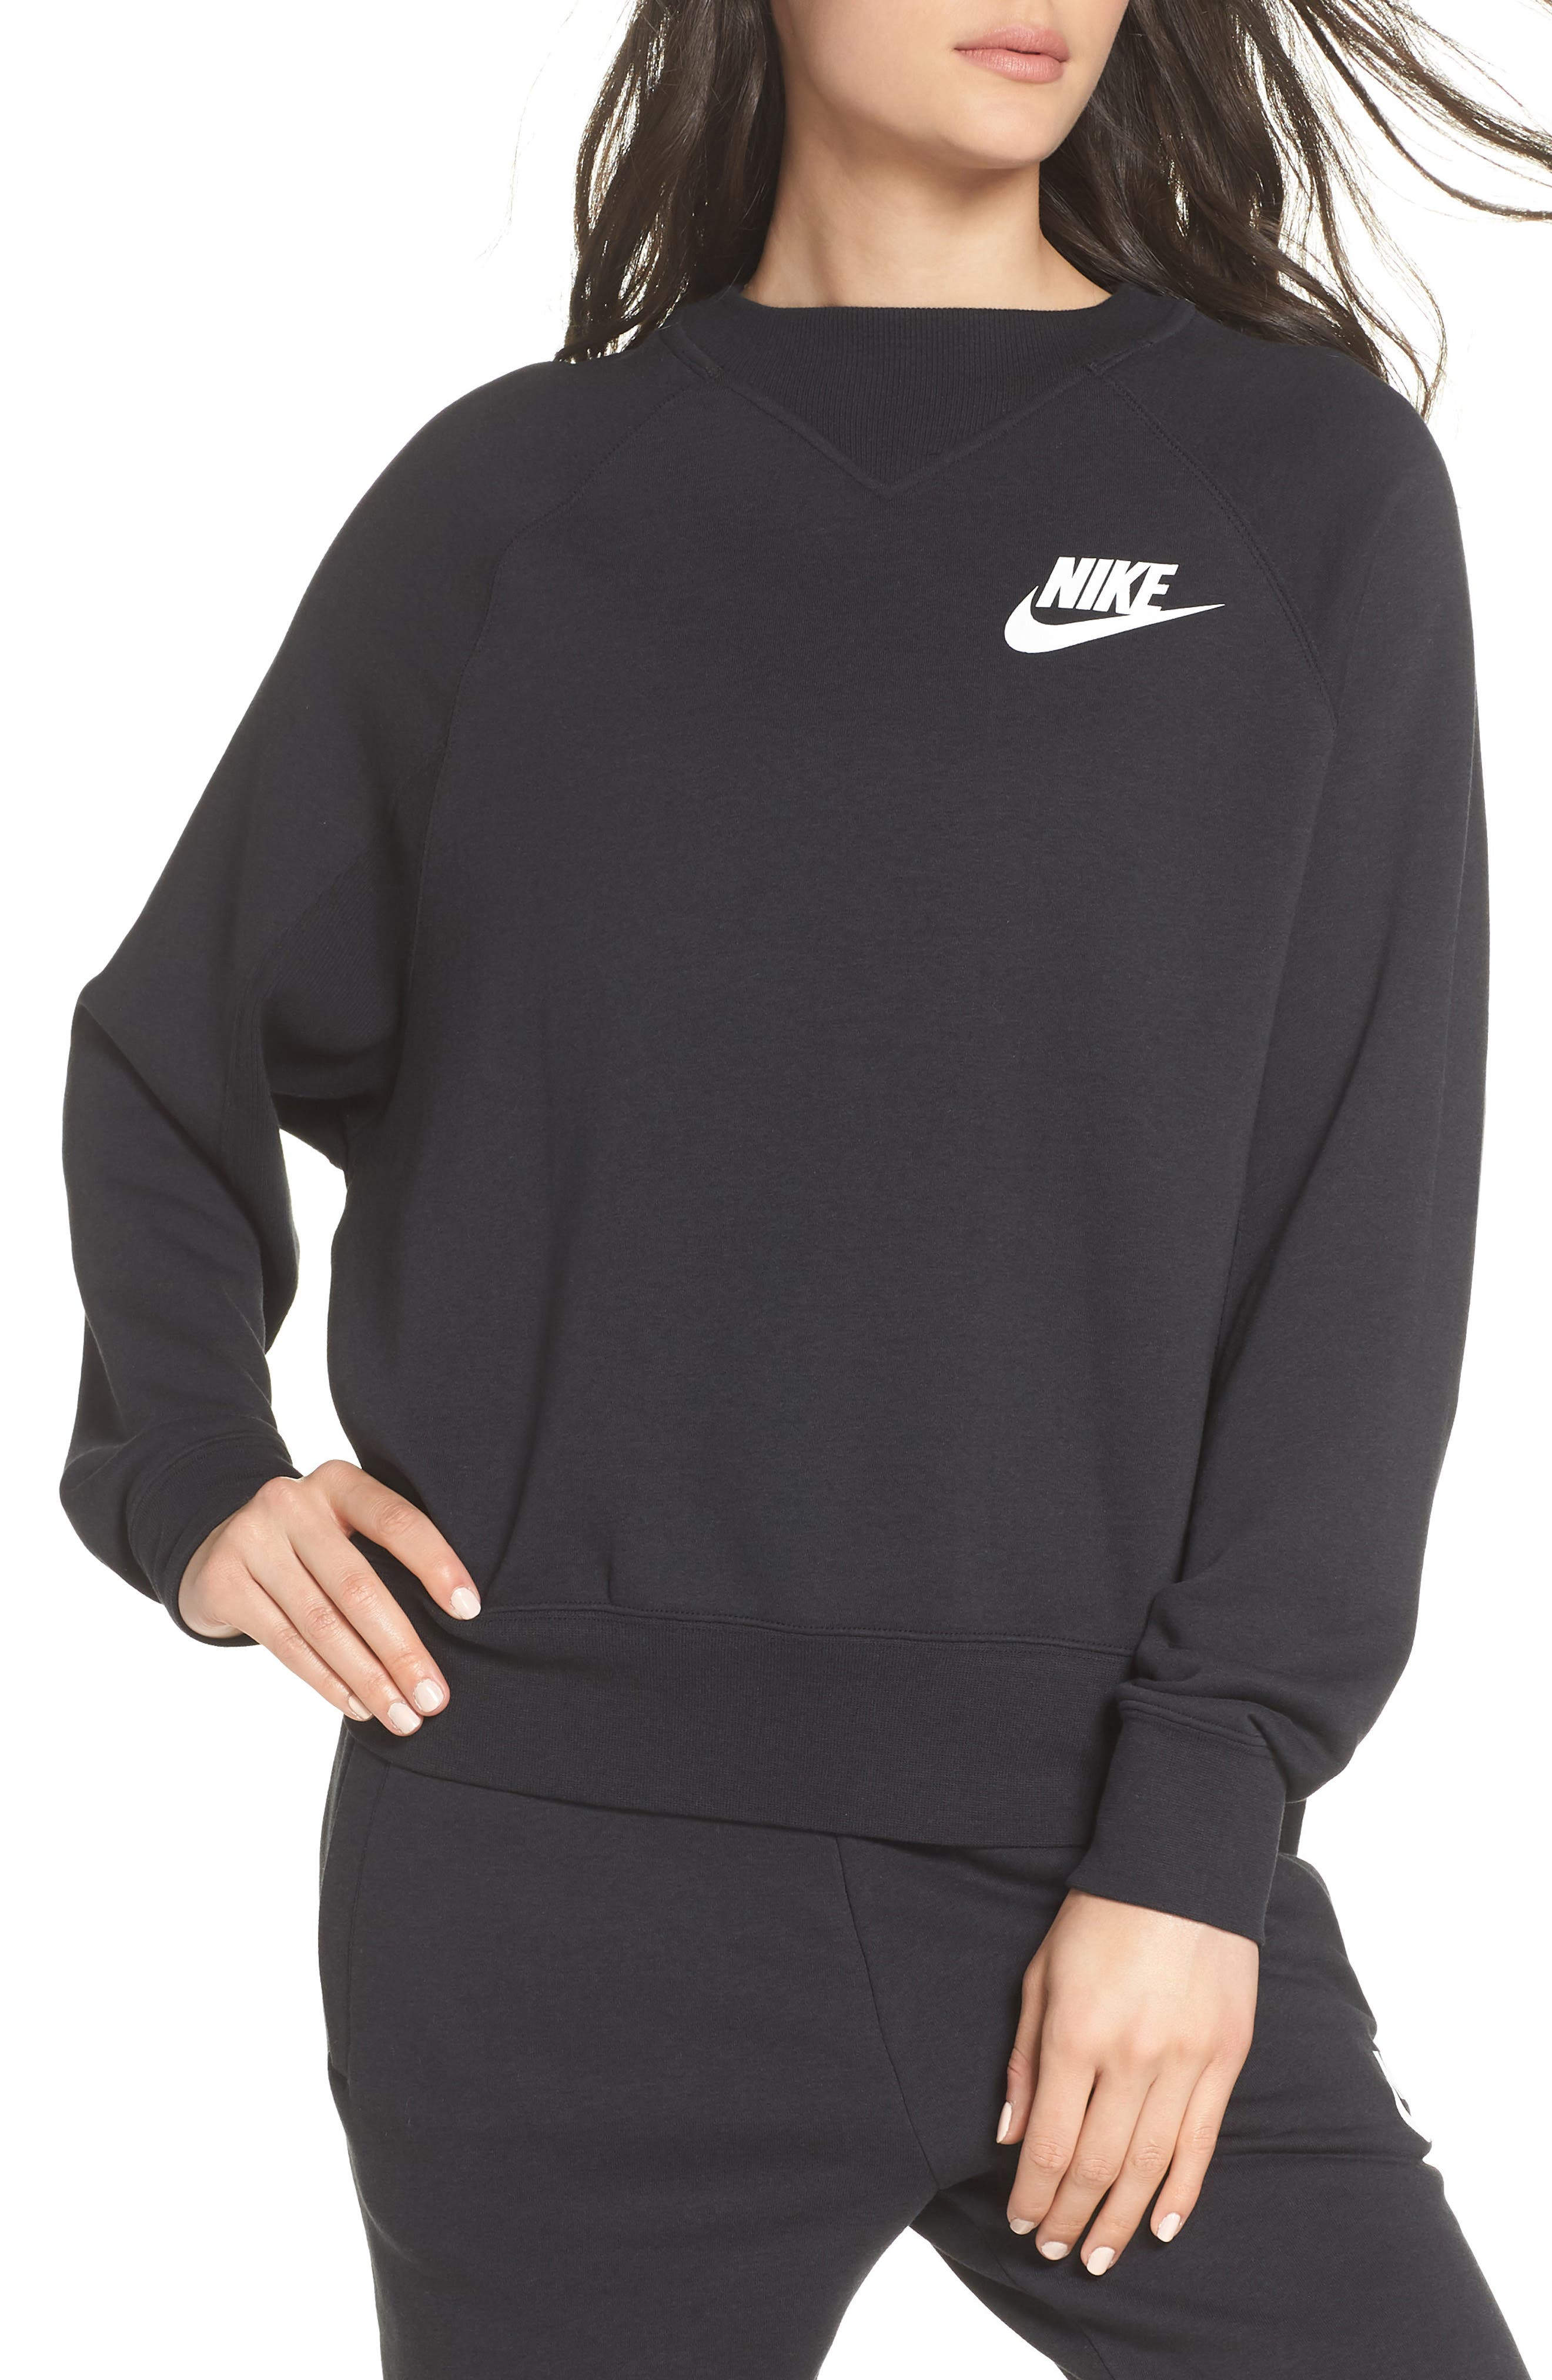 Sportswear Rally Sweatshirt,                             Main thumbnail 1, color,                             Black/ White